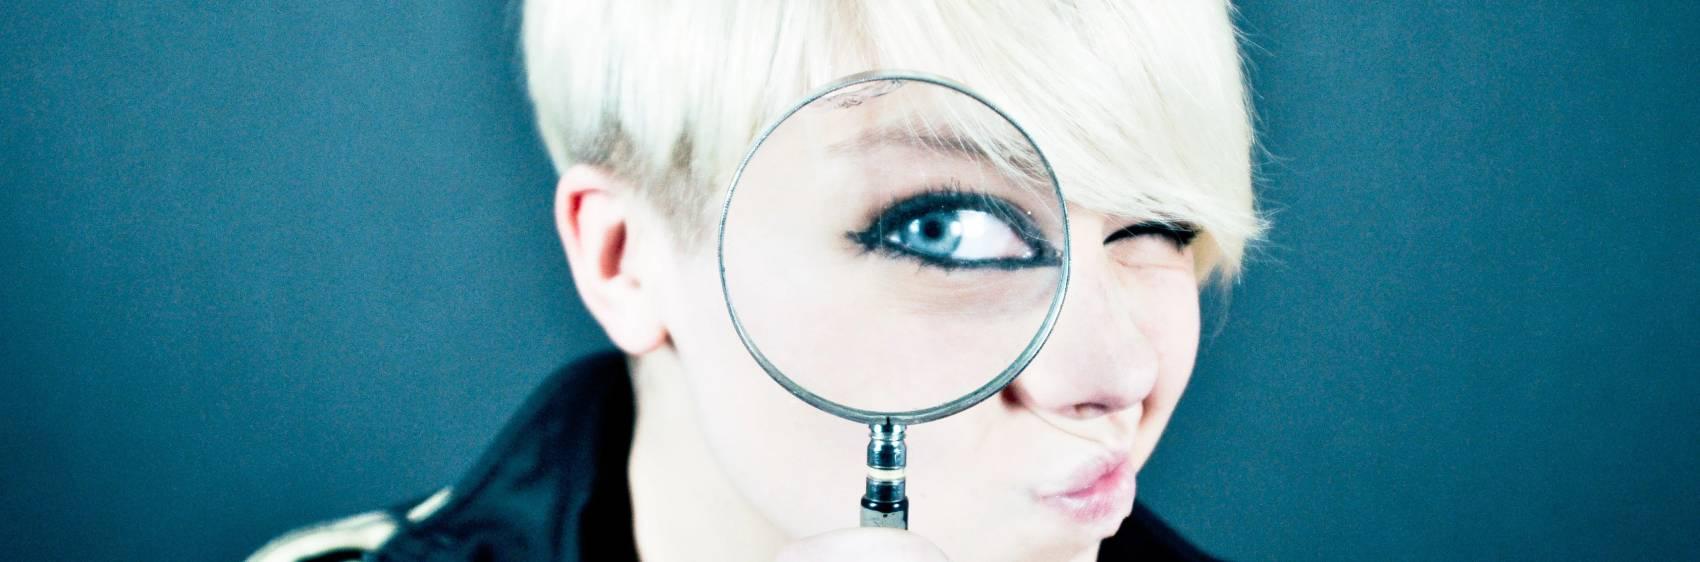 magnifying glass banner - emiliano-vittoriosi-0N_azCmUmcg-unsplash